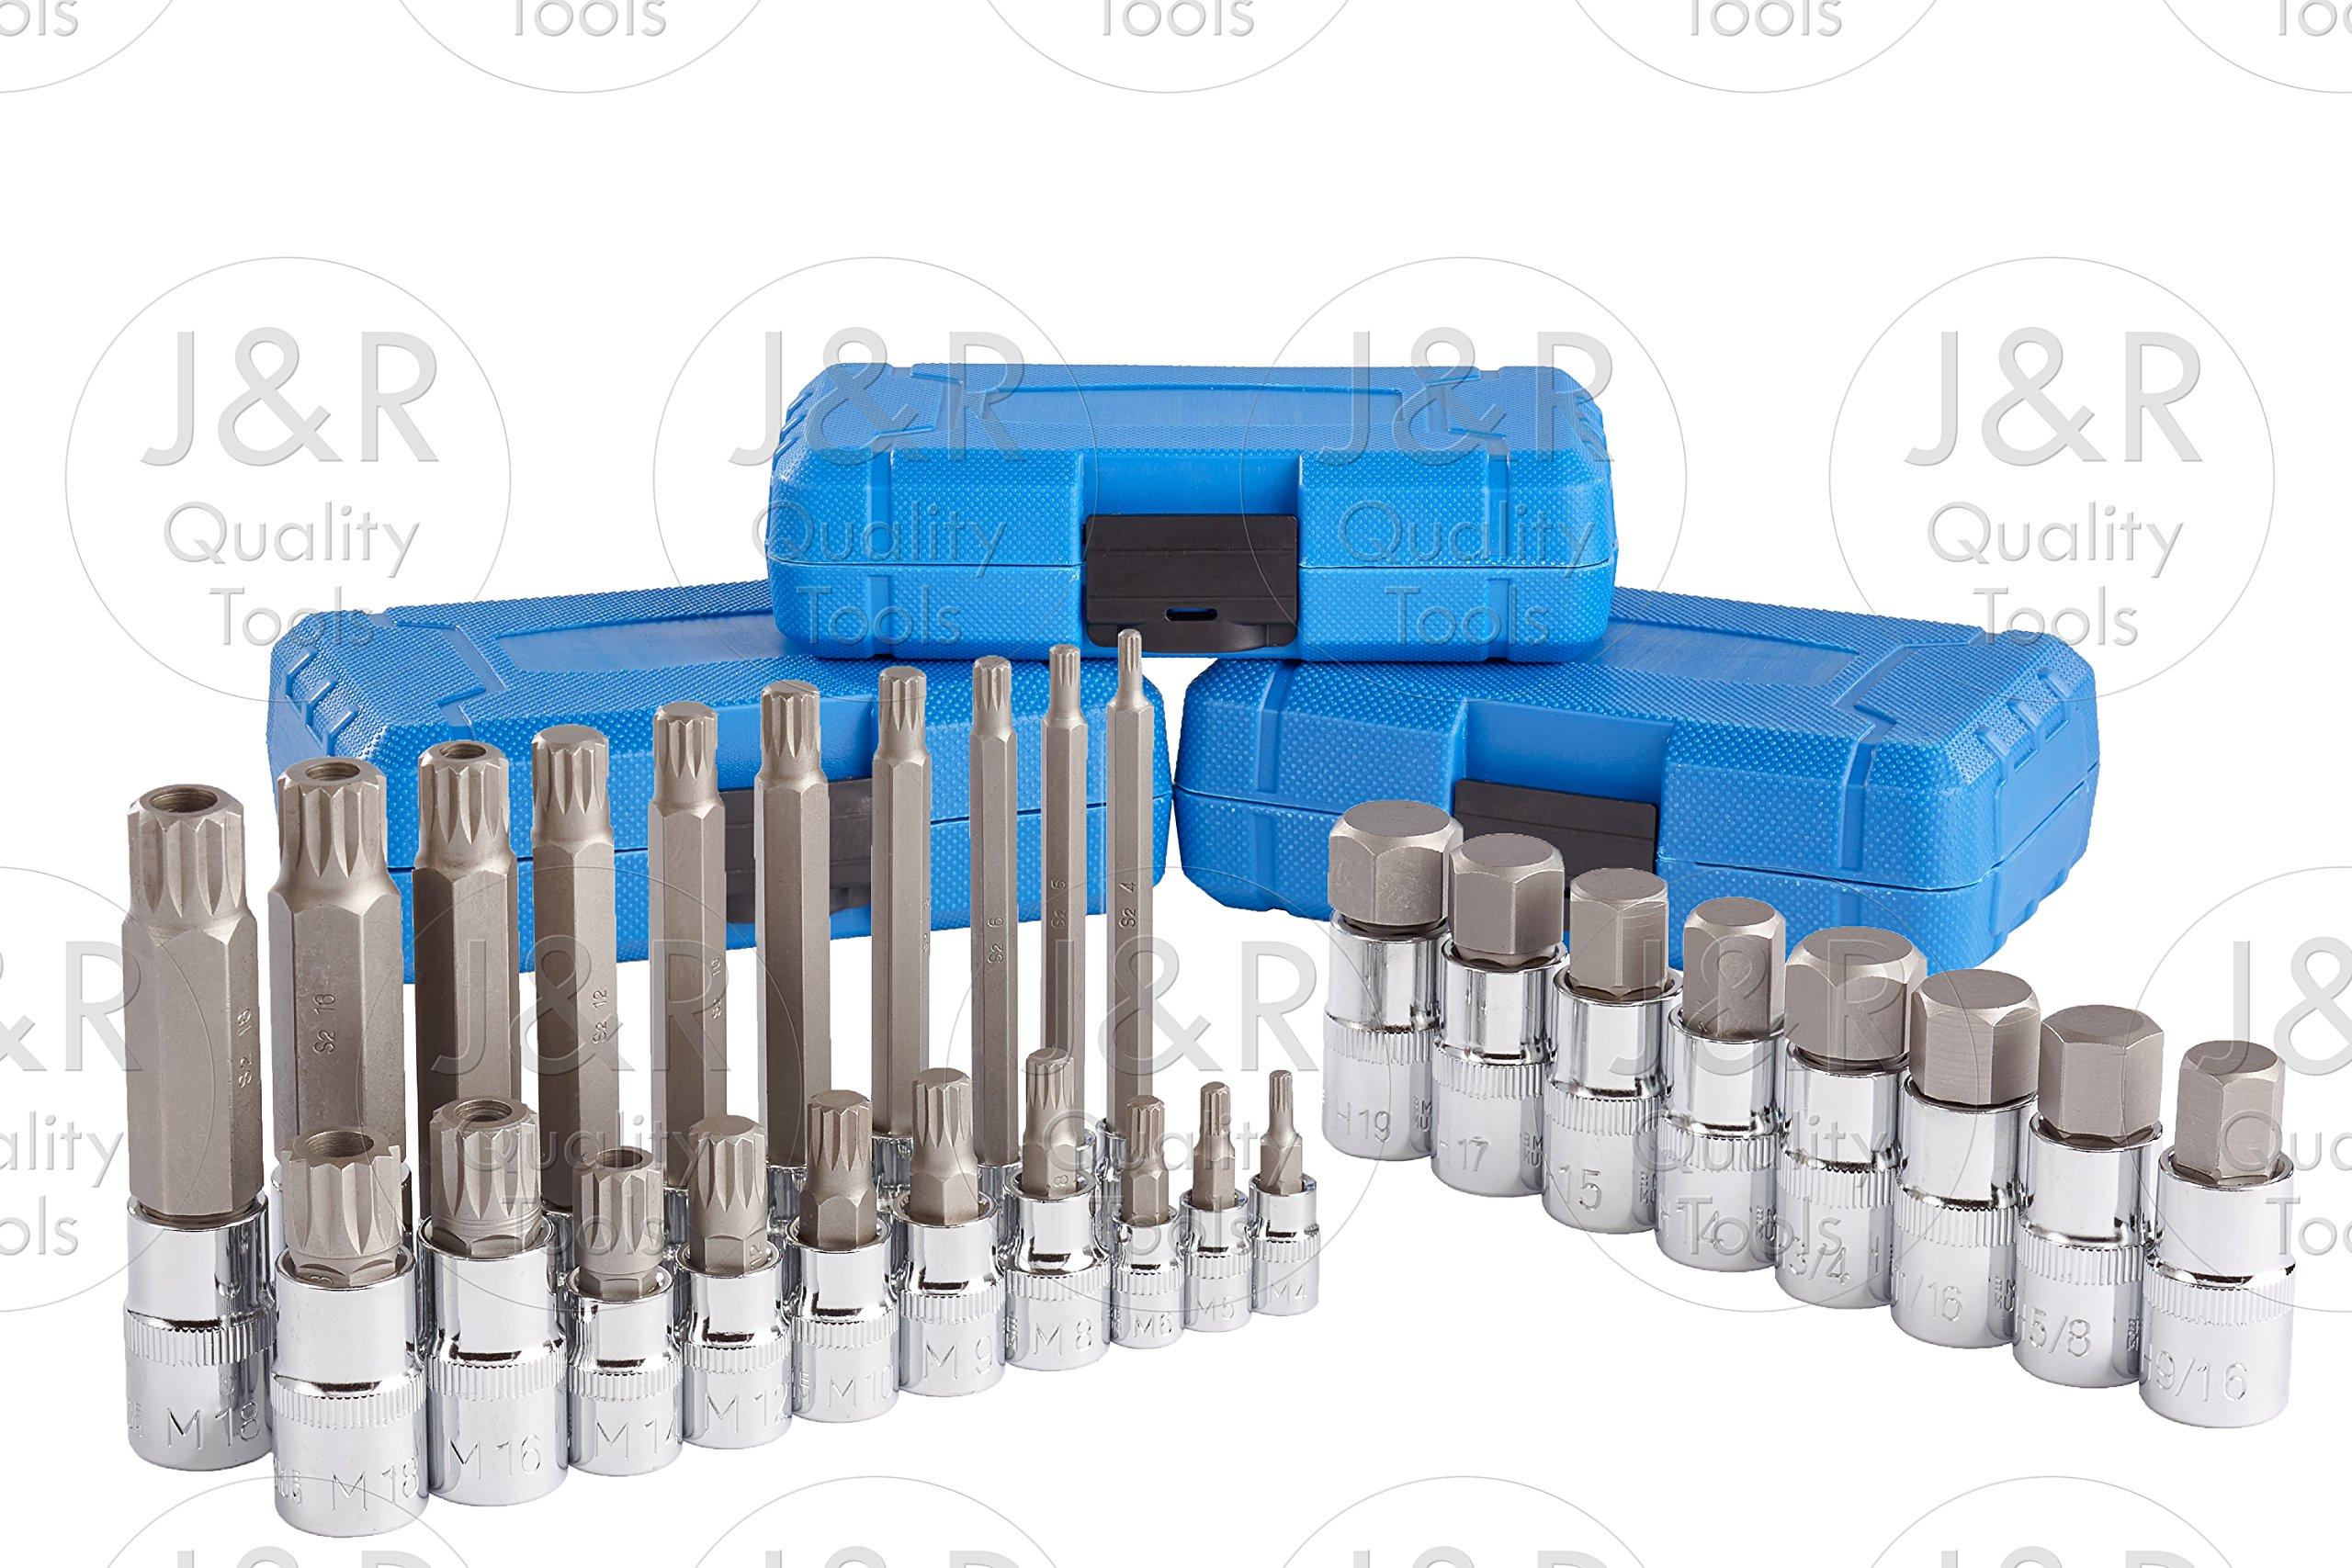 J&R Quality Tools 28pc Hex & XZN 12 Point MM Triple Square Spline Bit Socket Set Tamper Proof Bit by VECTOR